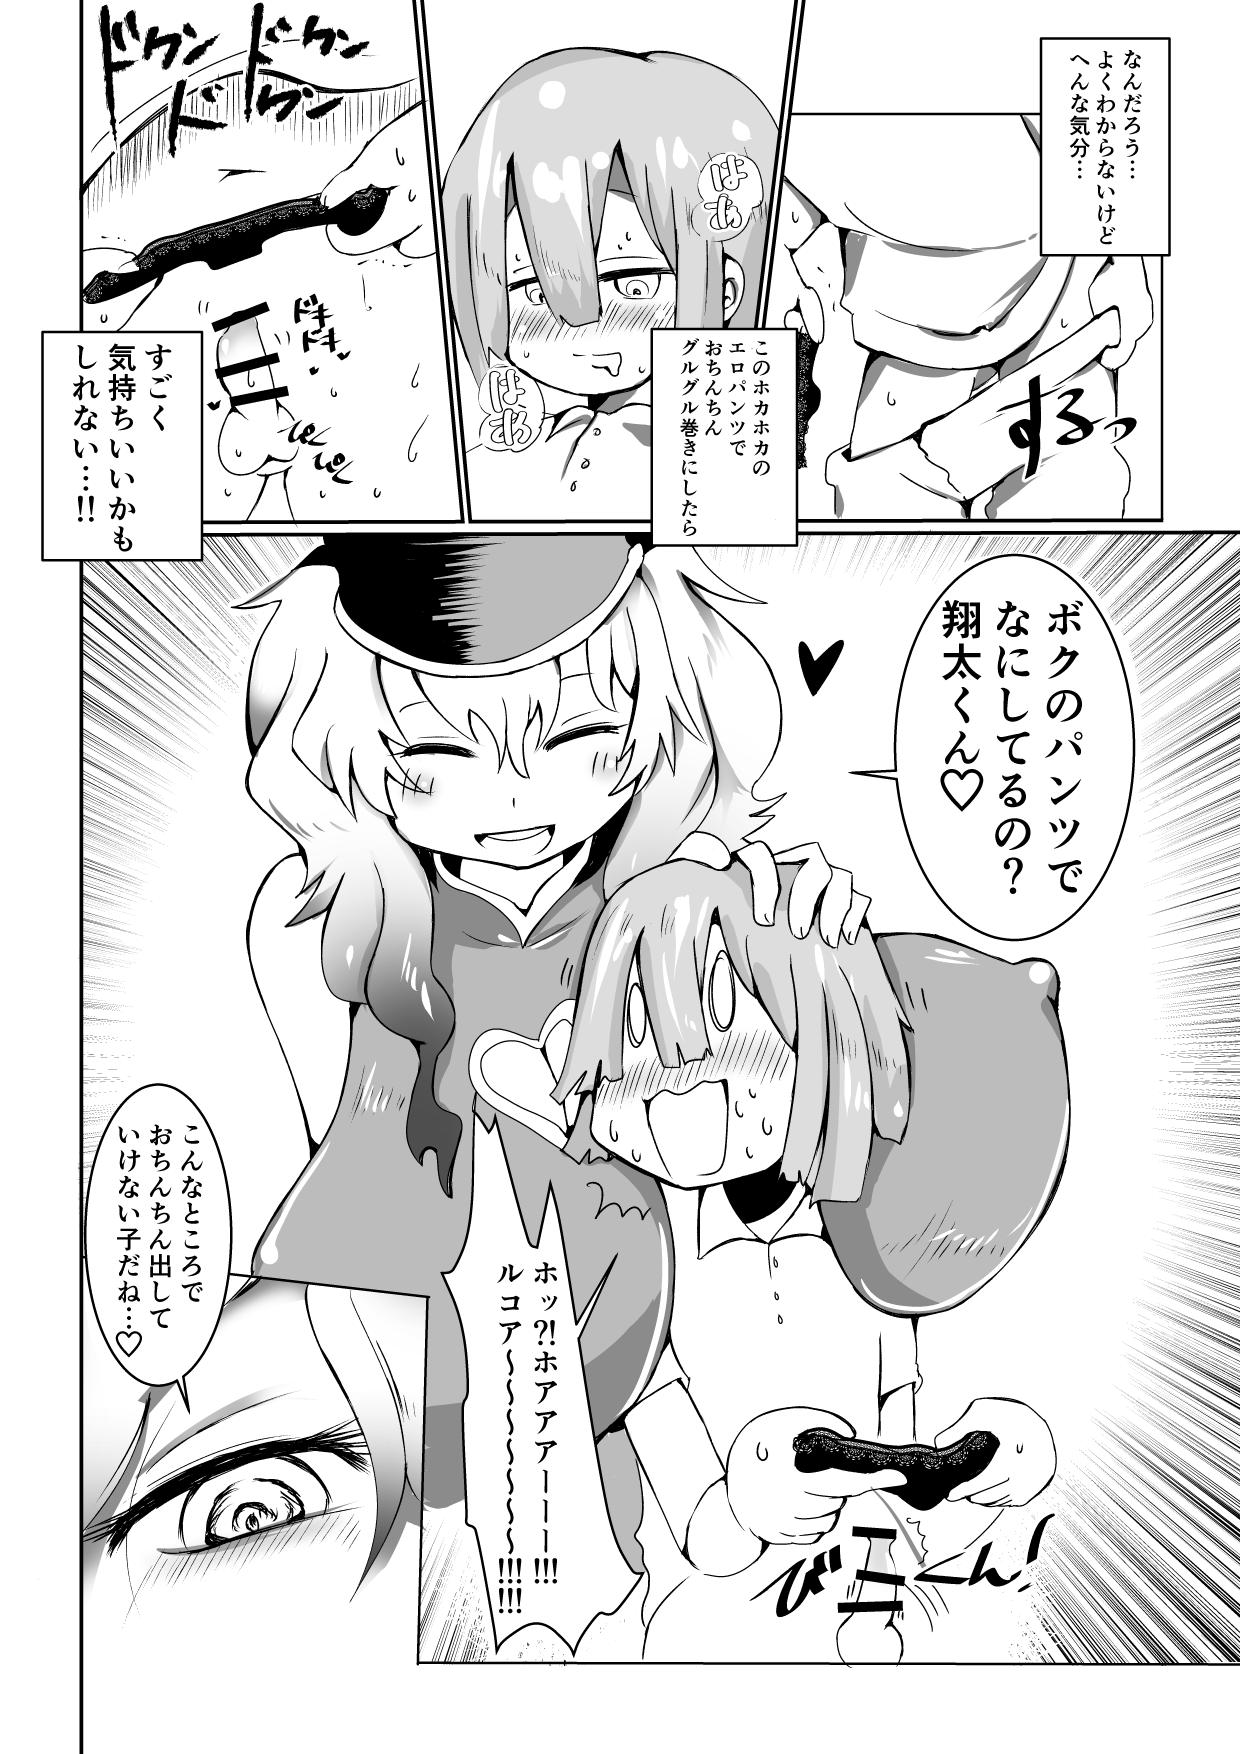 Shouta-kun First Time 6